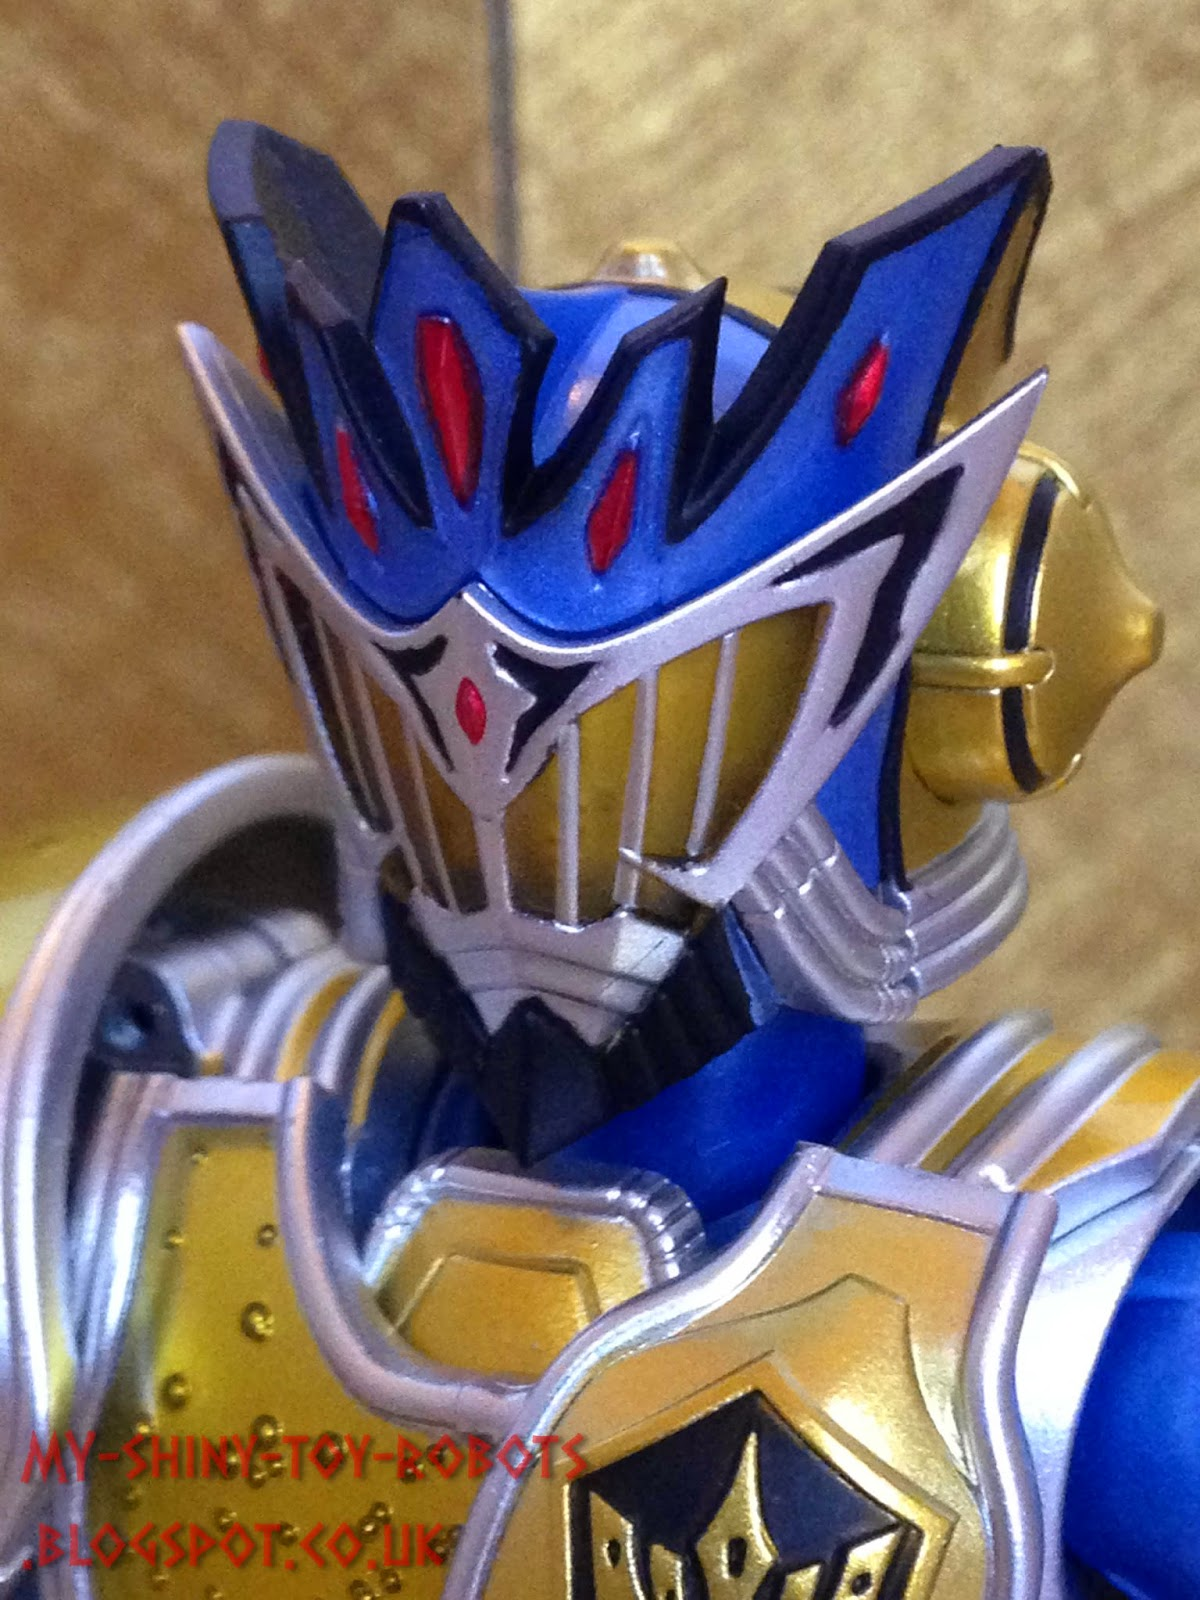 SH Figuarts Kamen Rider Duke